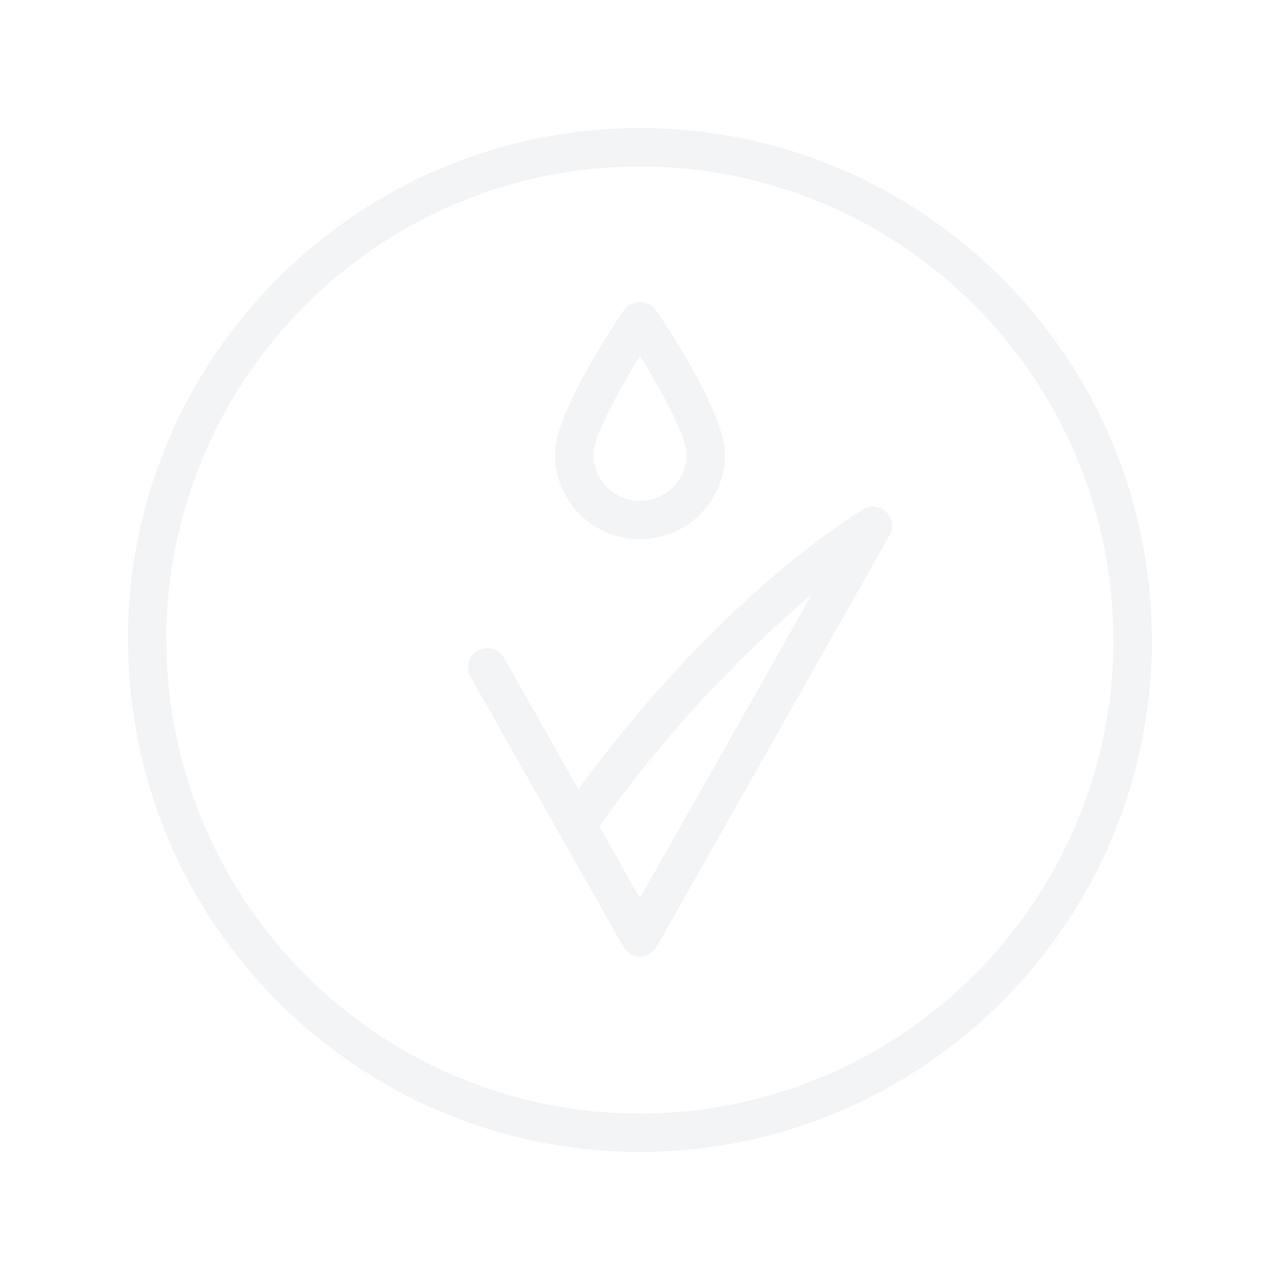 MINIGOLD Ario Earrings